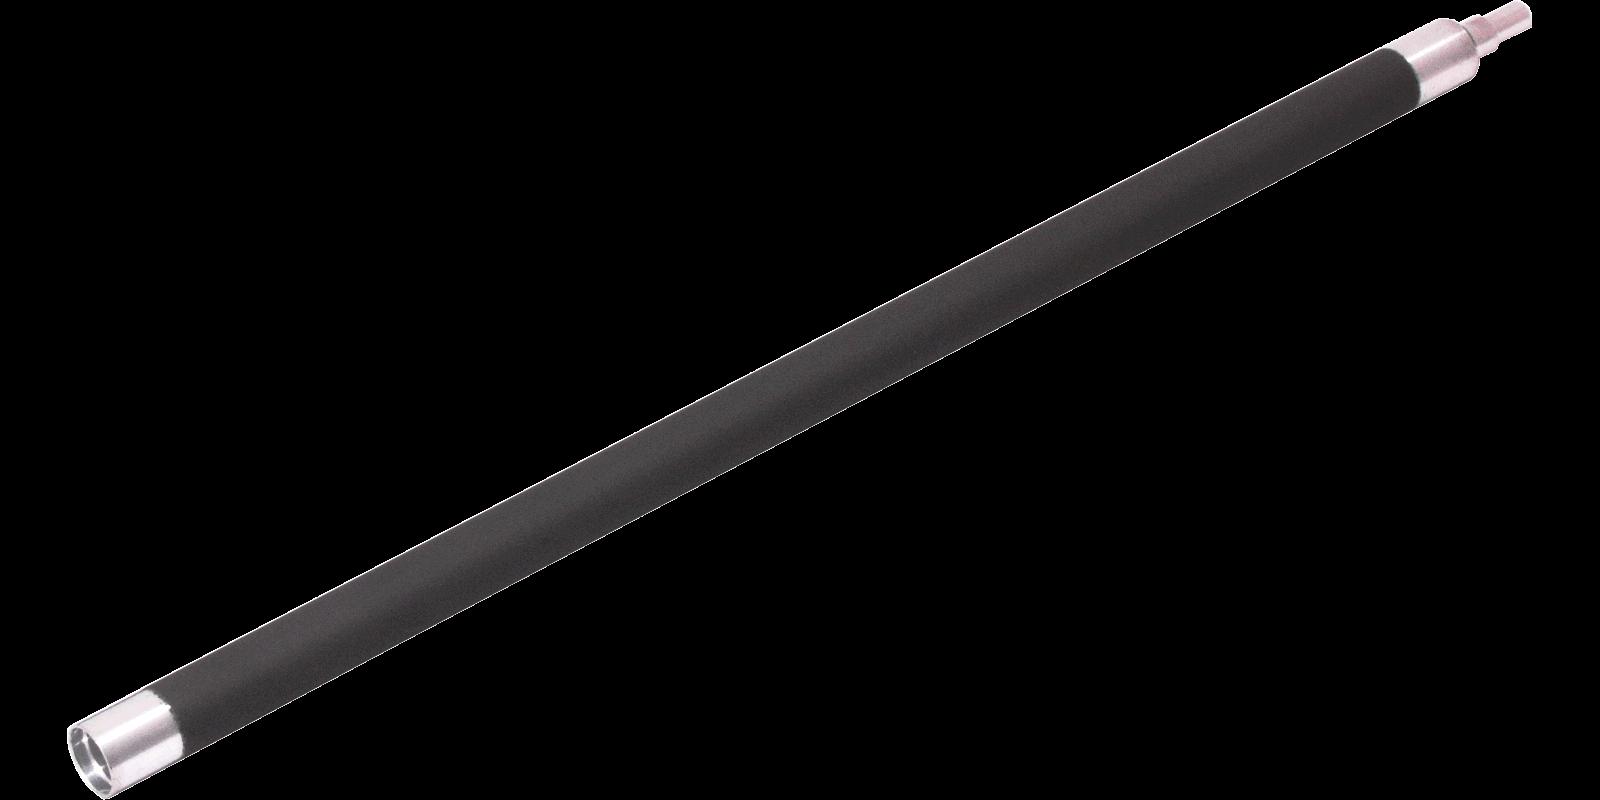 MAK Sleeve CE285A/CE278A-CB435A/CB436A, оболочка магнитного вала (без внутреннего магнитного стержня)